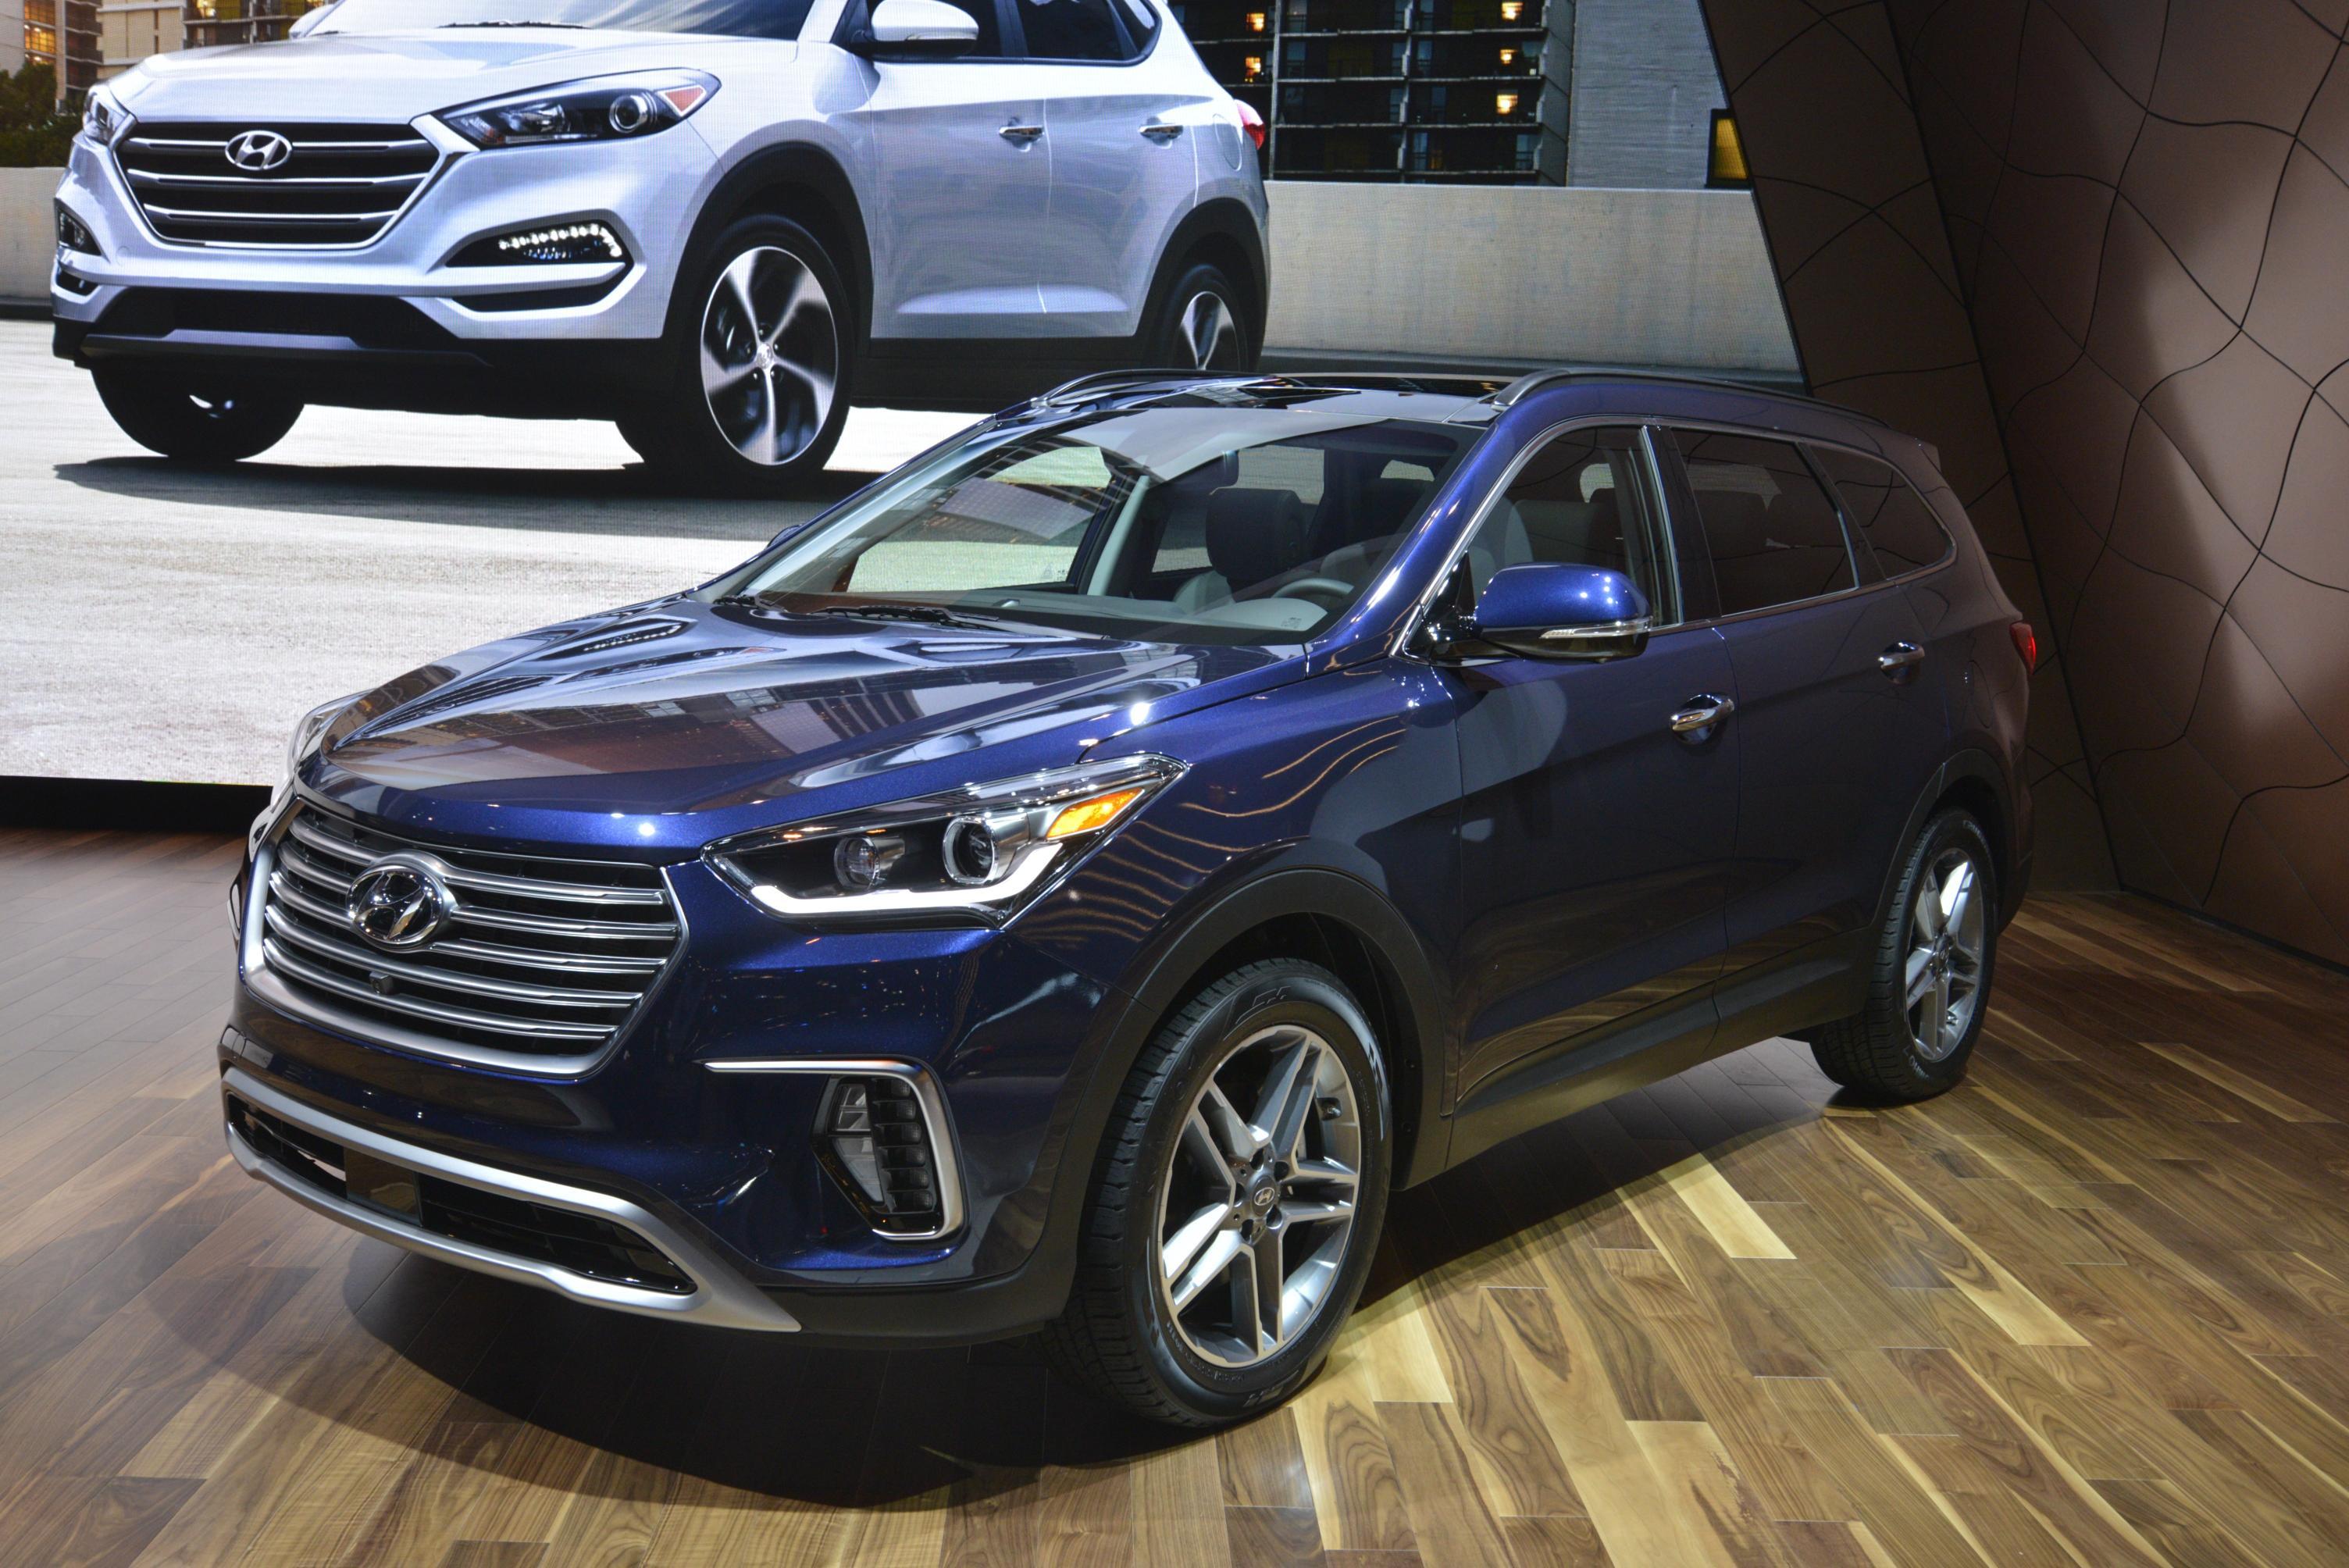 2017 Hyundai Santa Fe Thinks It's Got a Sexy Facelift in ...